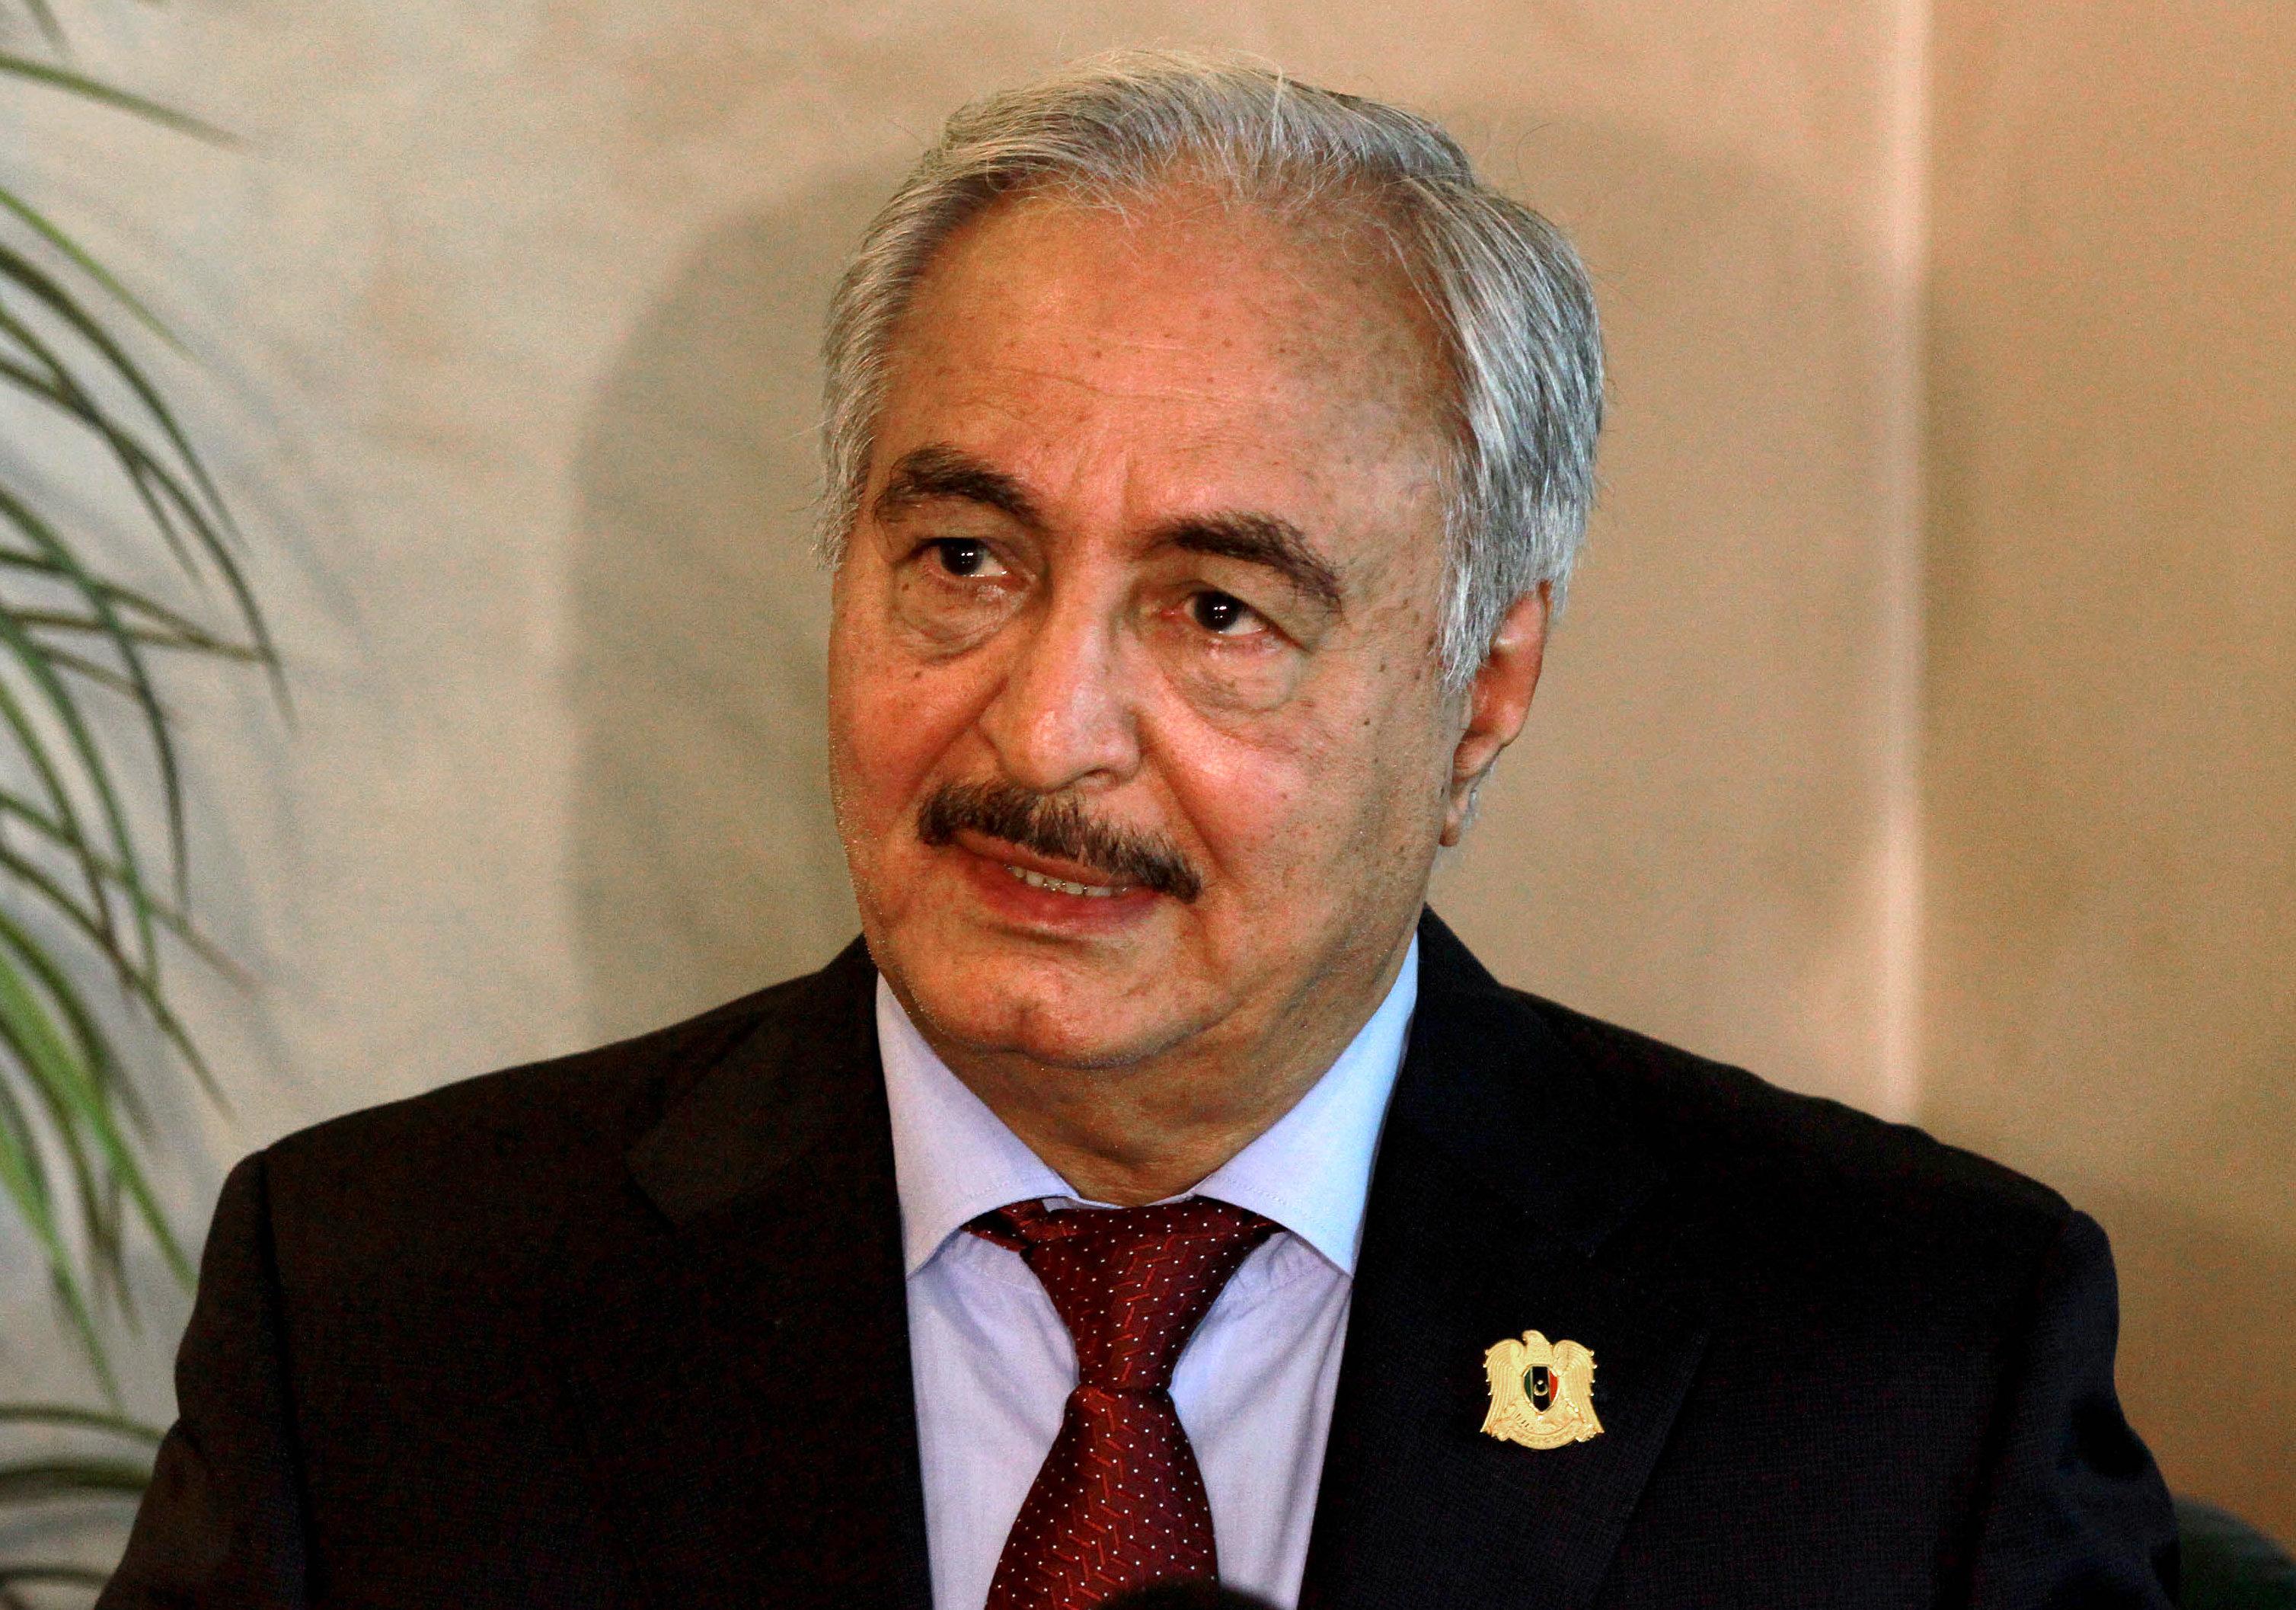 politique libye refuse nouvelle intervention militaire occidentale